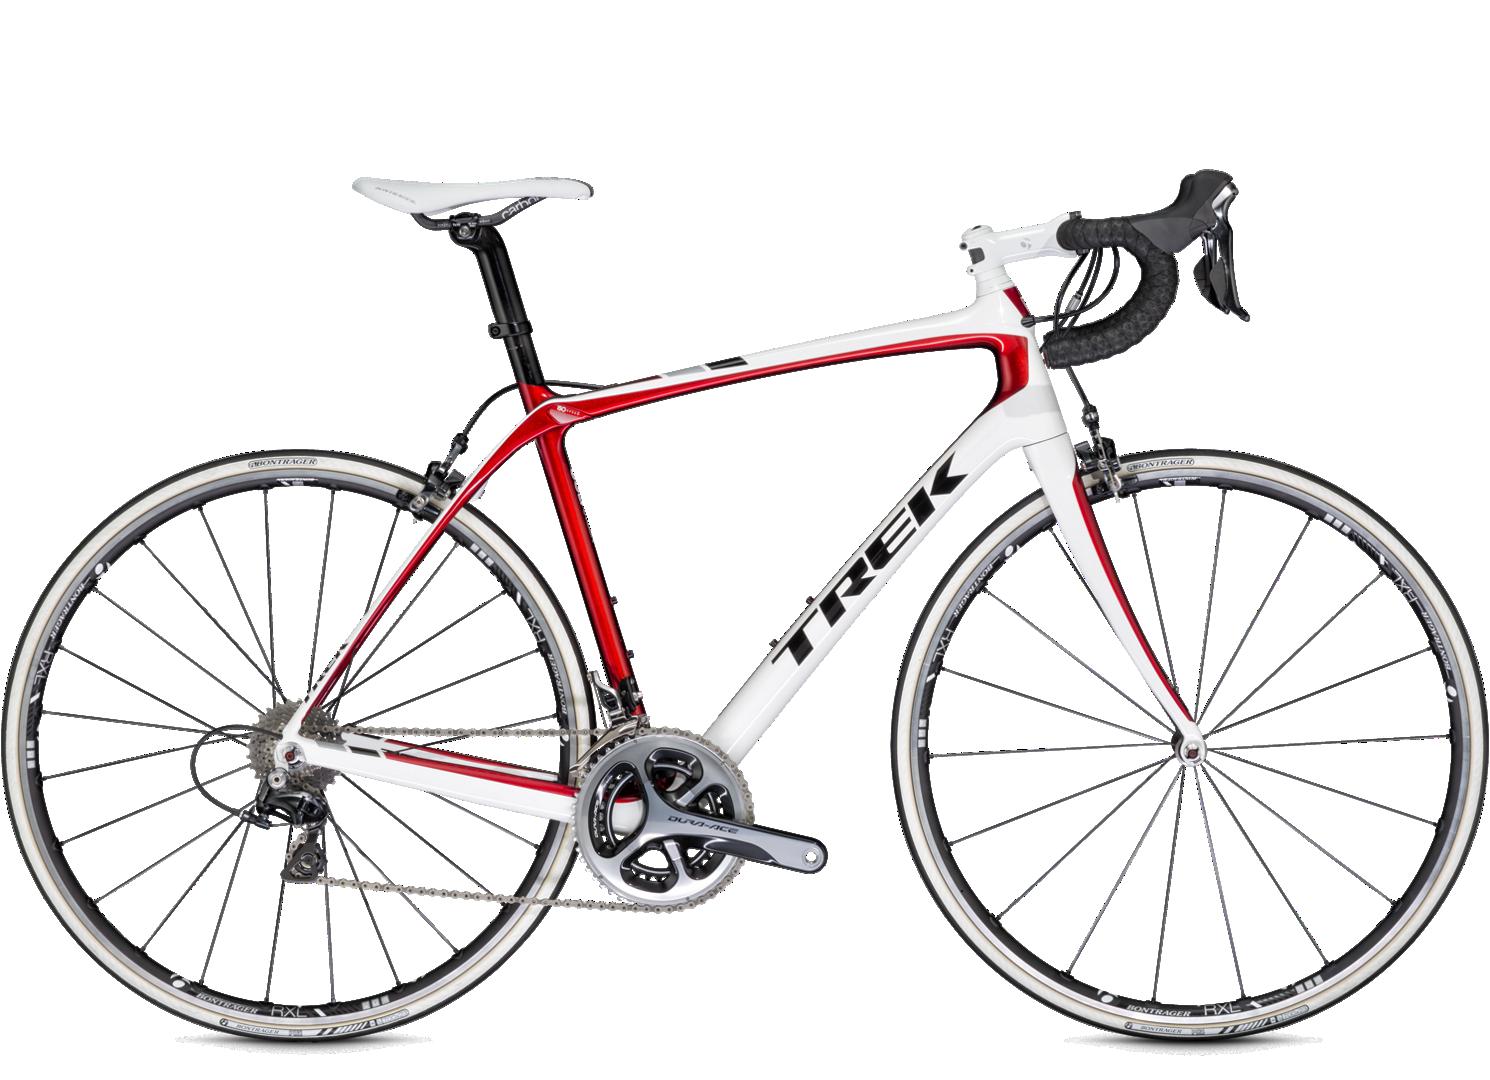 Domane 6 9 Trek Bicycle